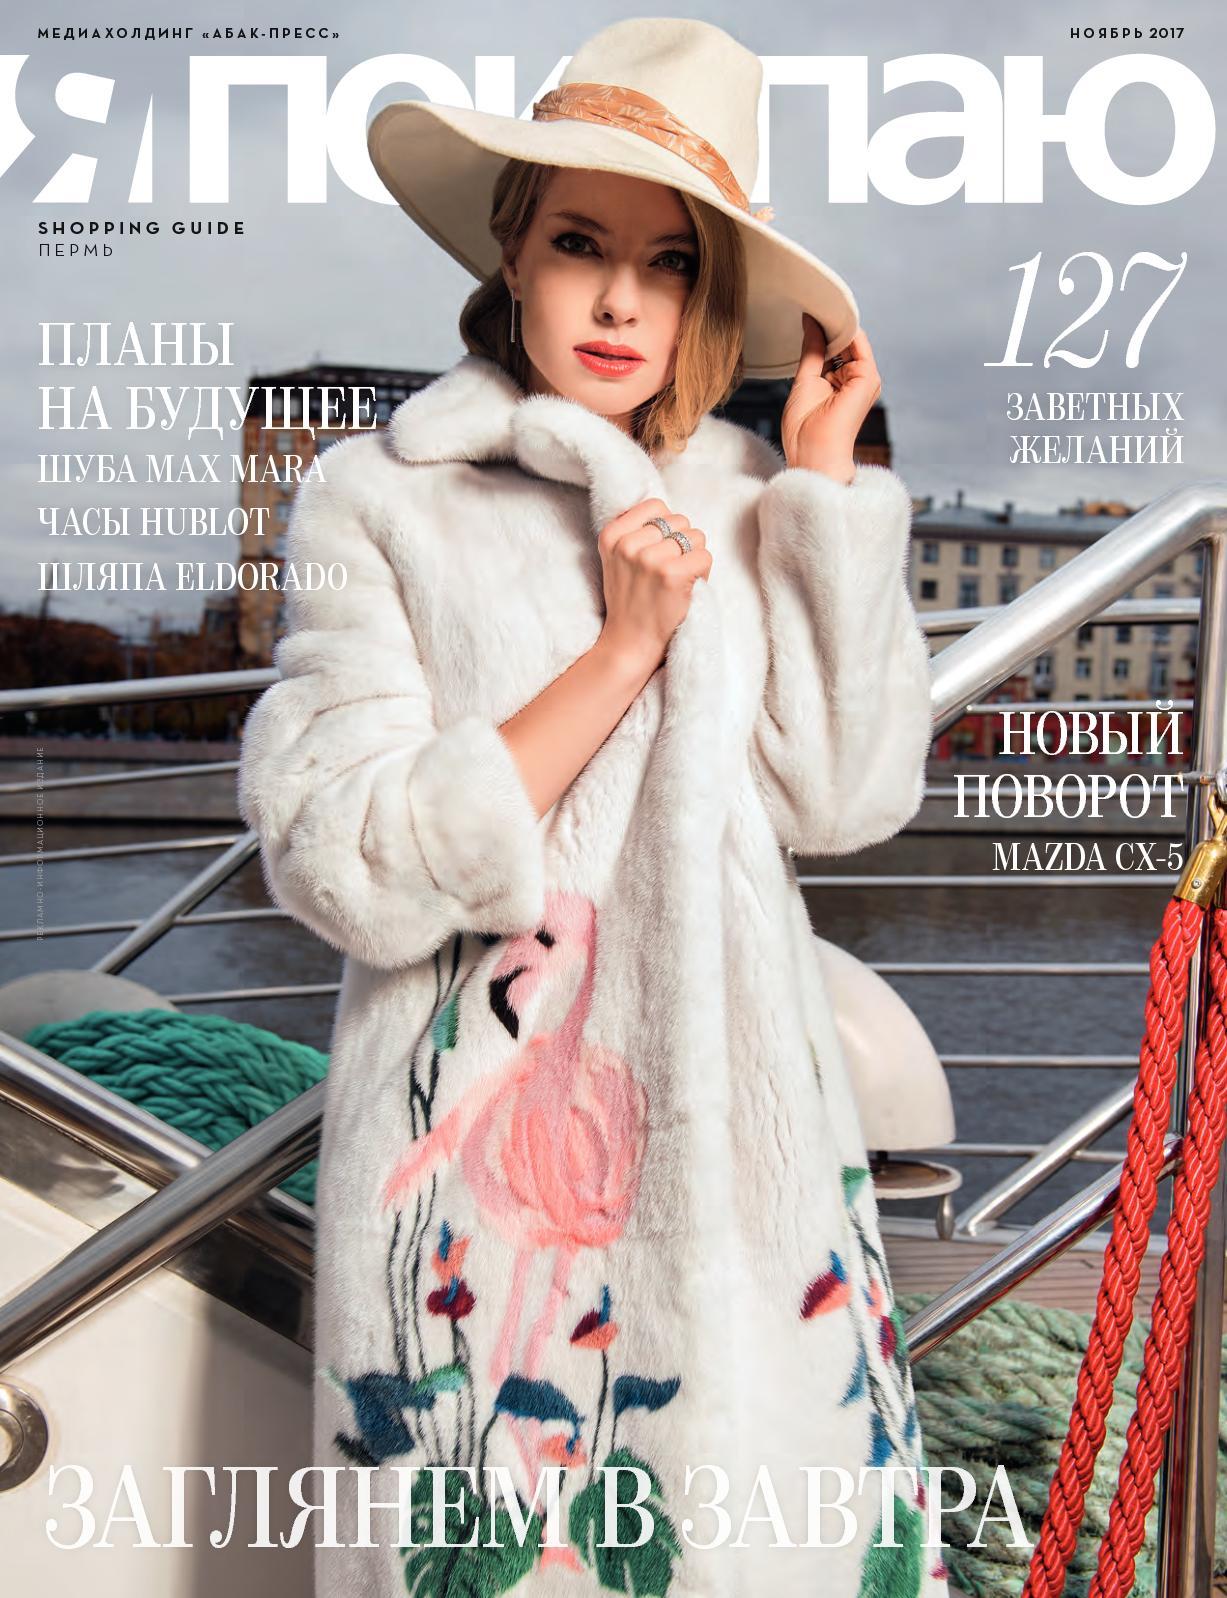 f16030d0dcc0 Calaméo - Shopping Guide «Я Покупаю. Пермь», ноябрь 2017